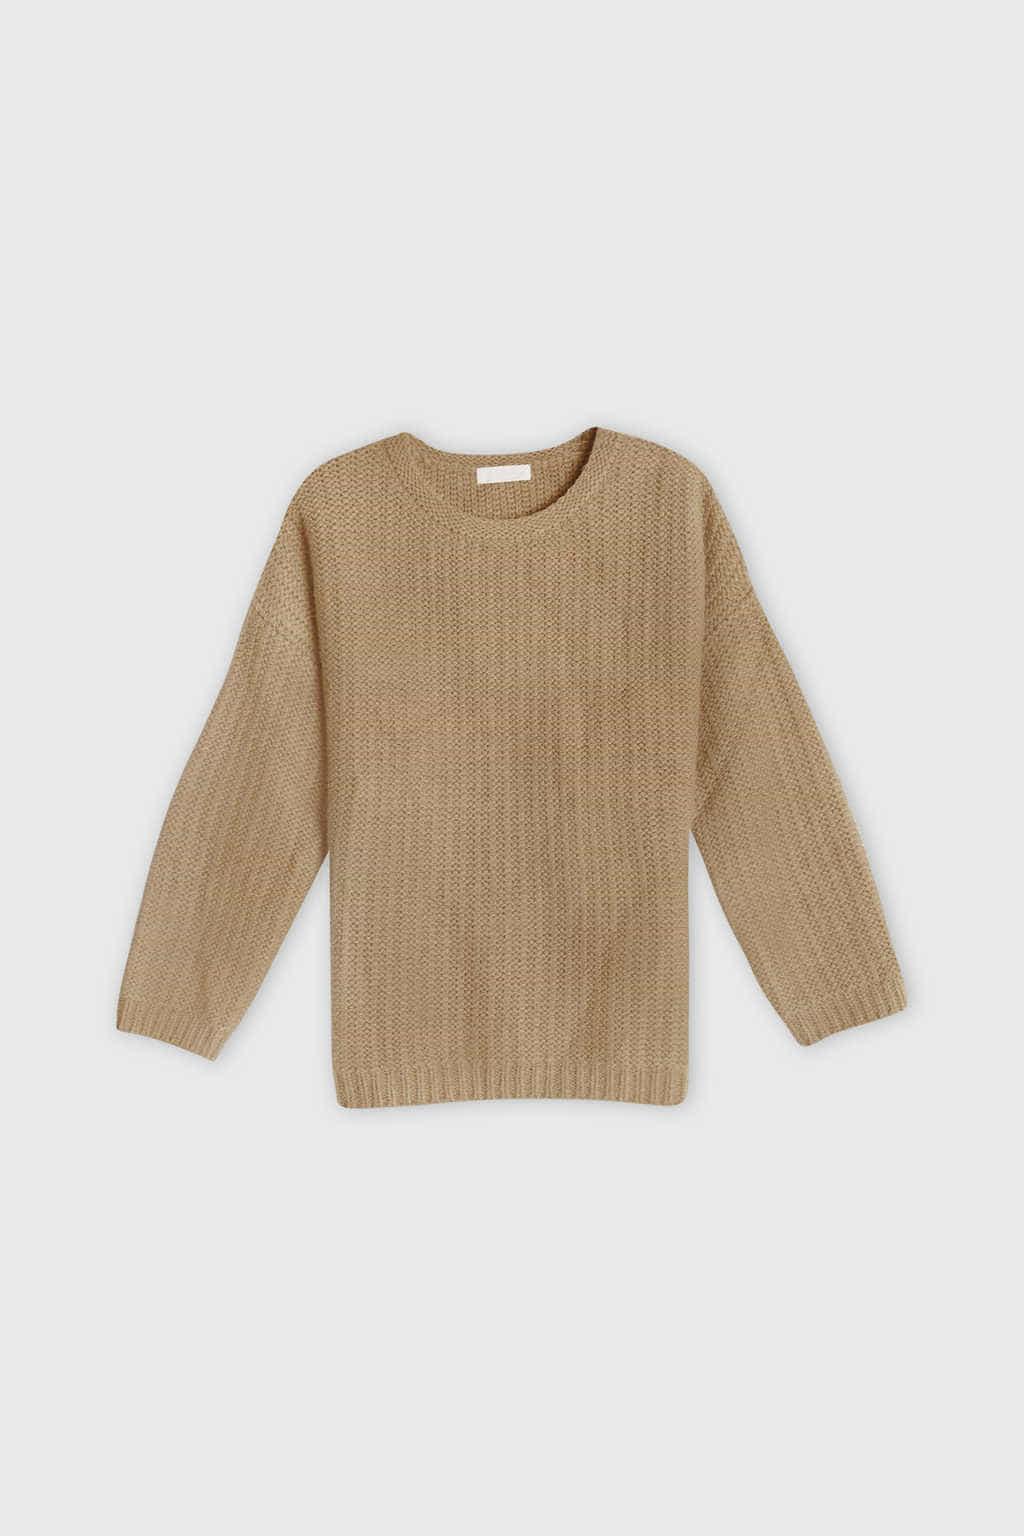 Sweater 2596 Camel 6